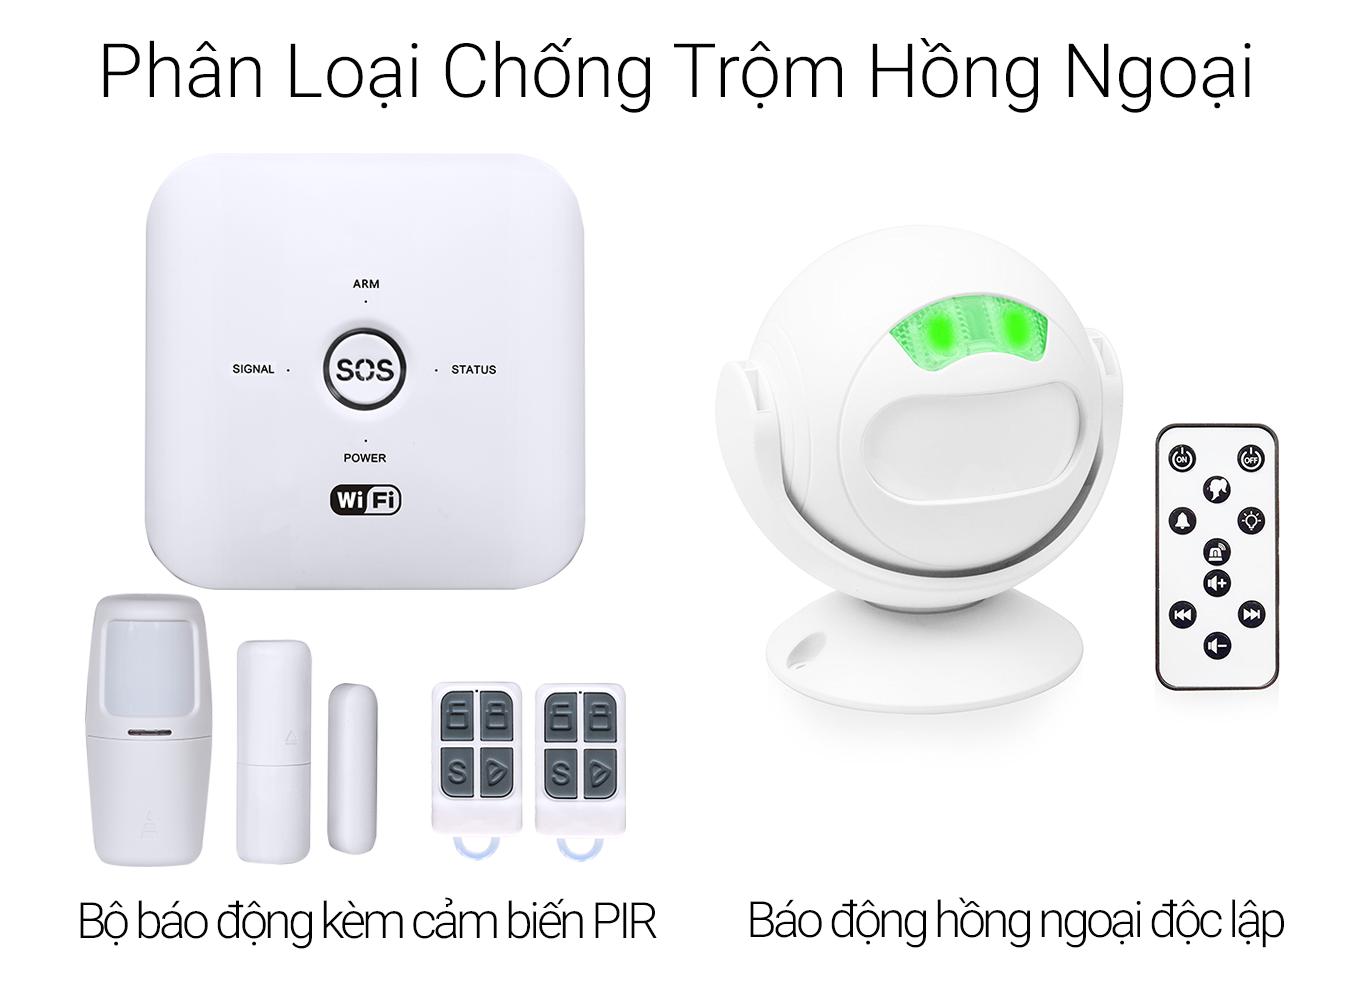 phan-loai-bao-dong-hong-ngoai